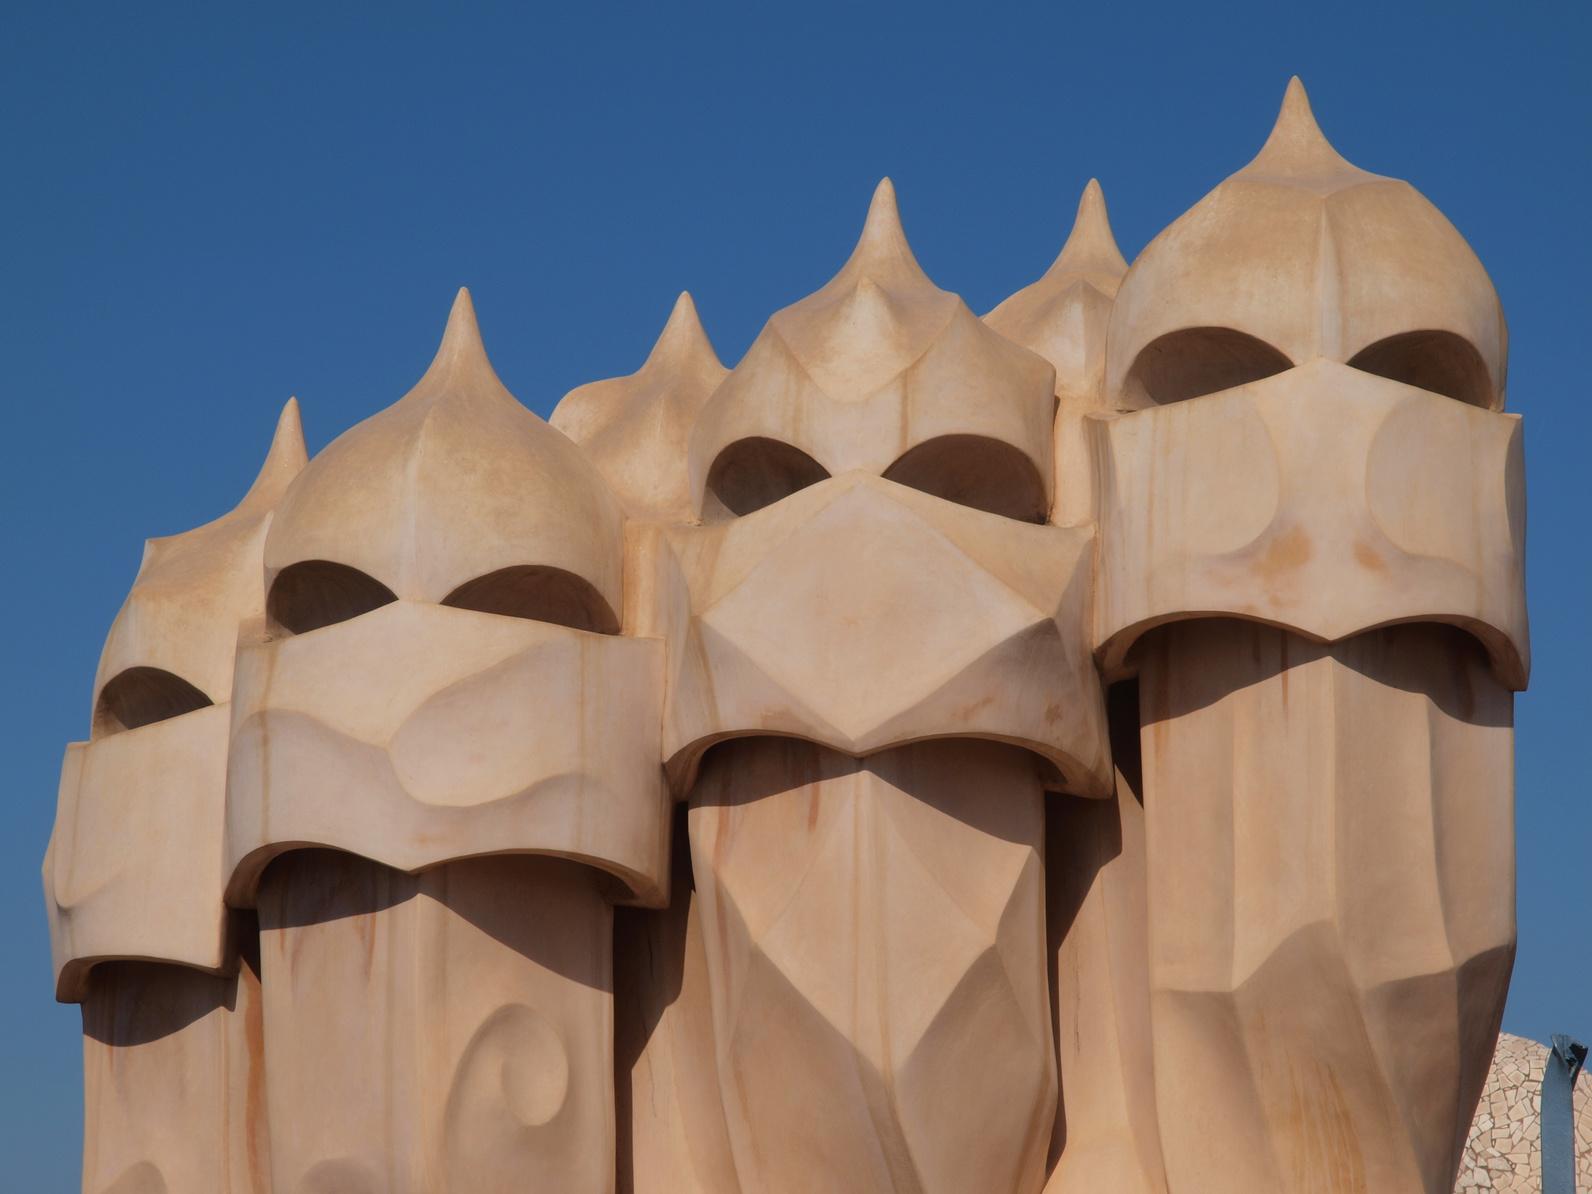 modernism in barcelona top 10 sights